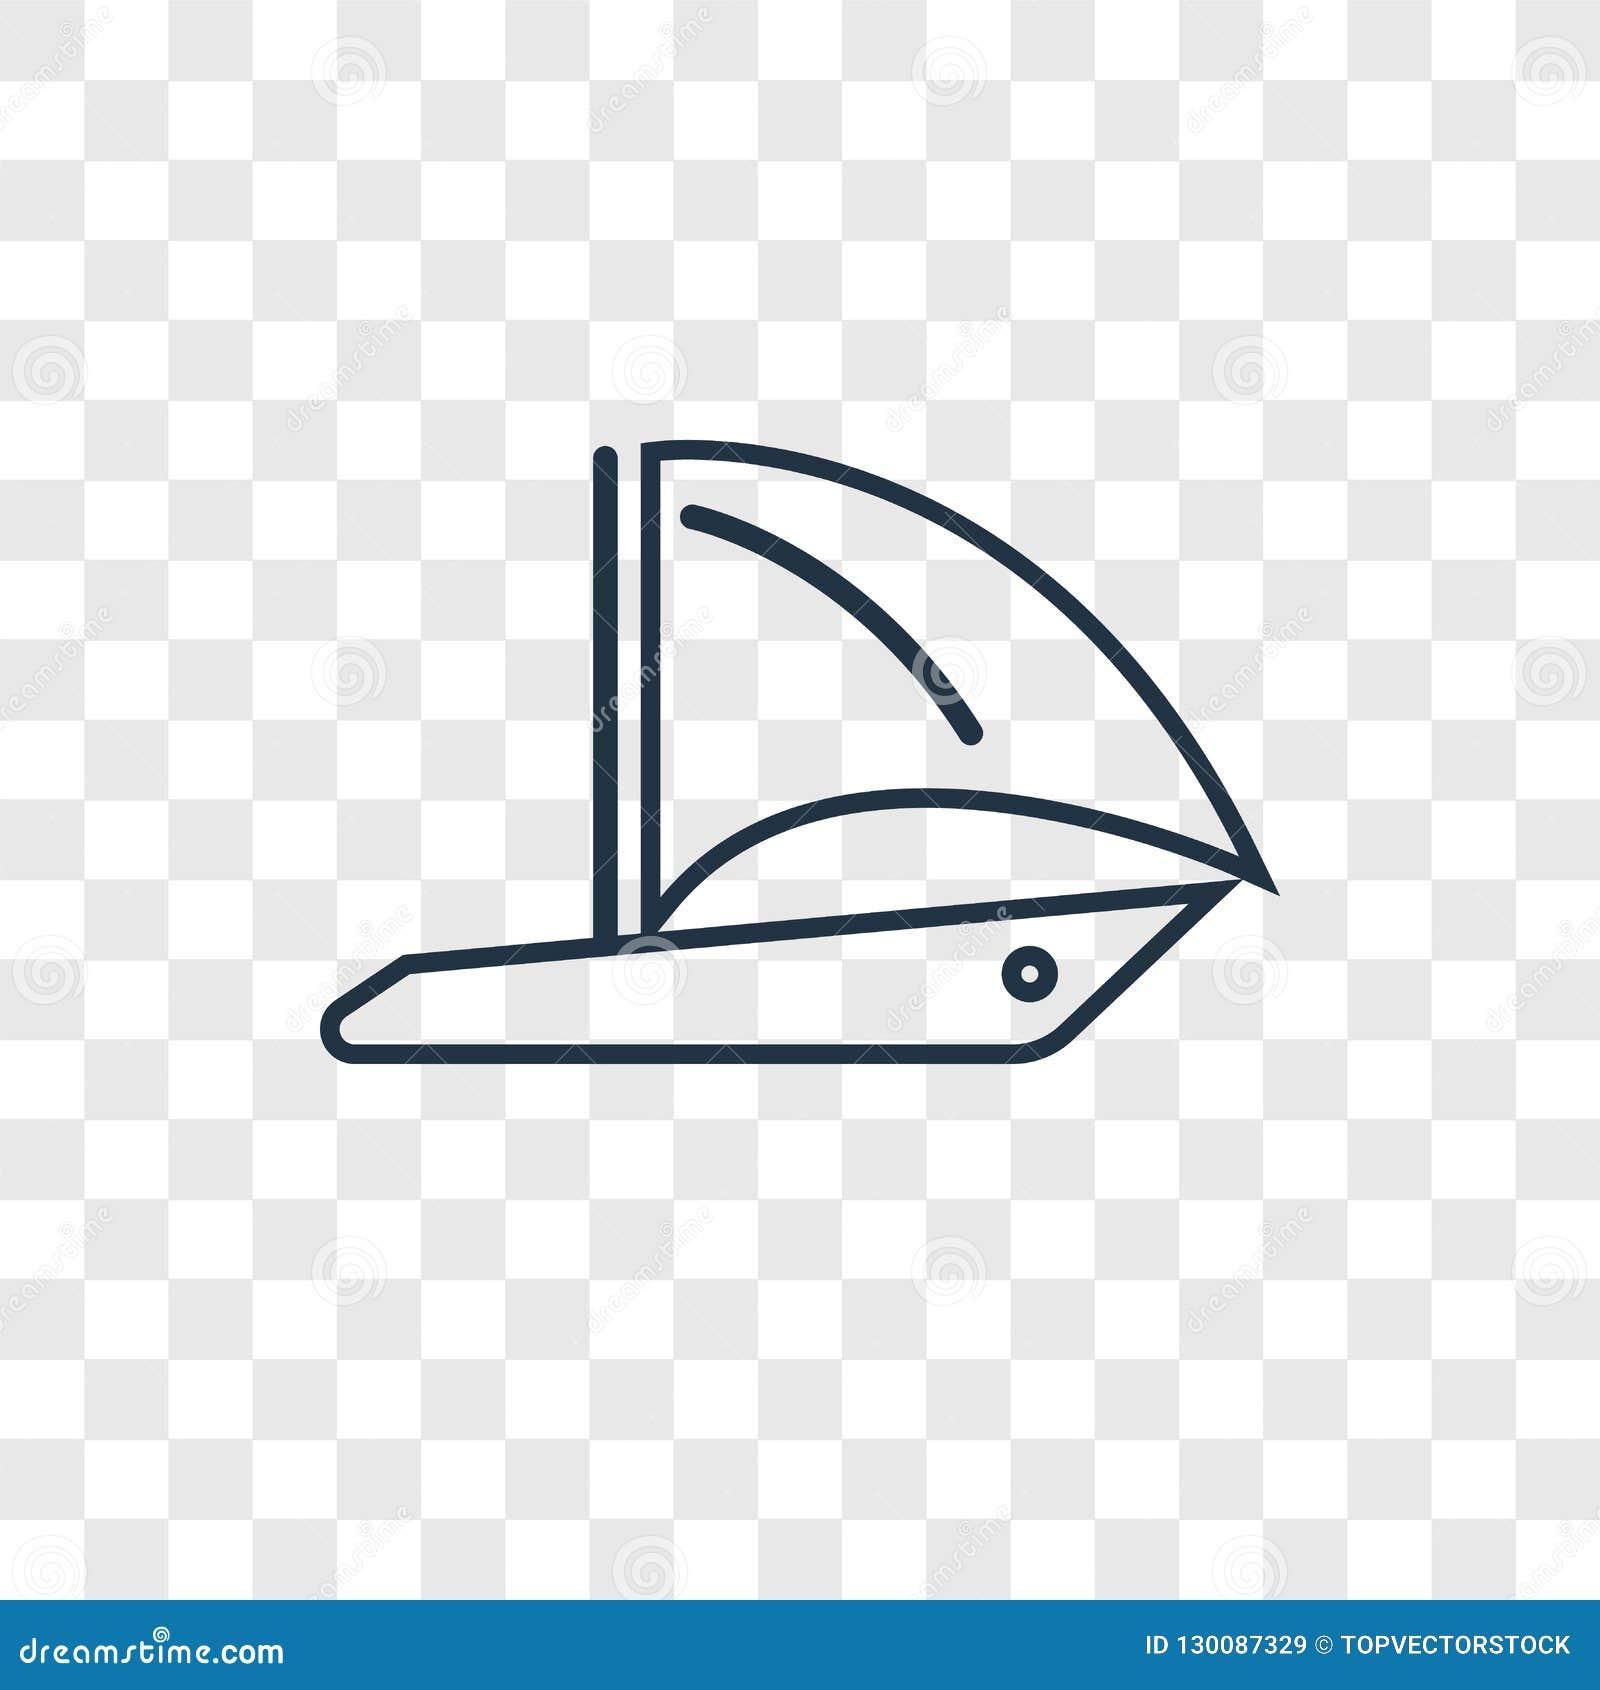 O ícone linear do vetor redondo do conceito do veleiro isolado sobre transparen